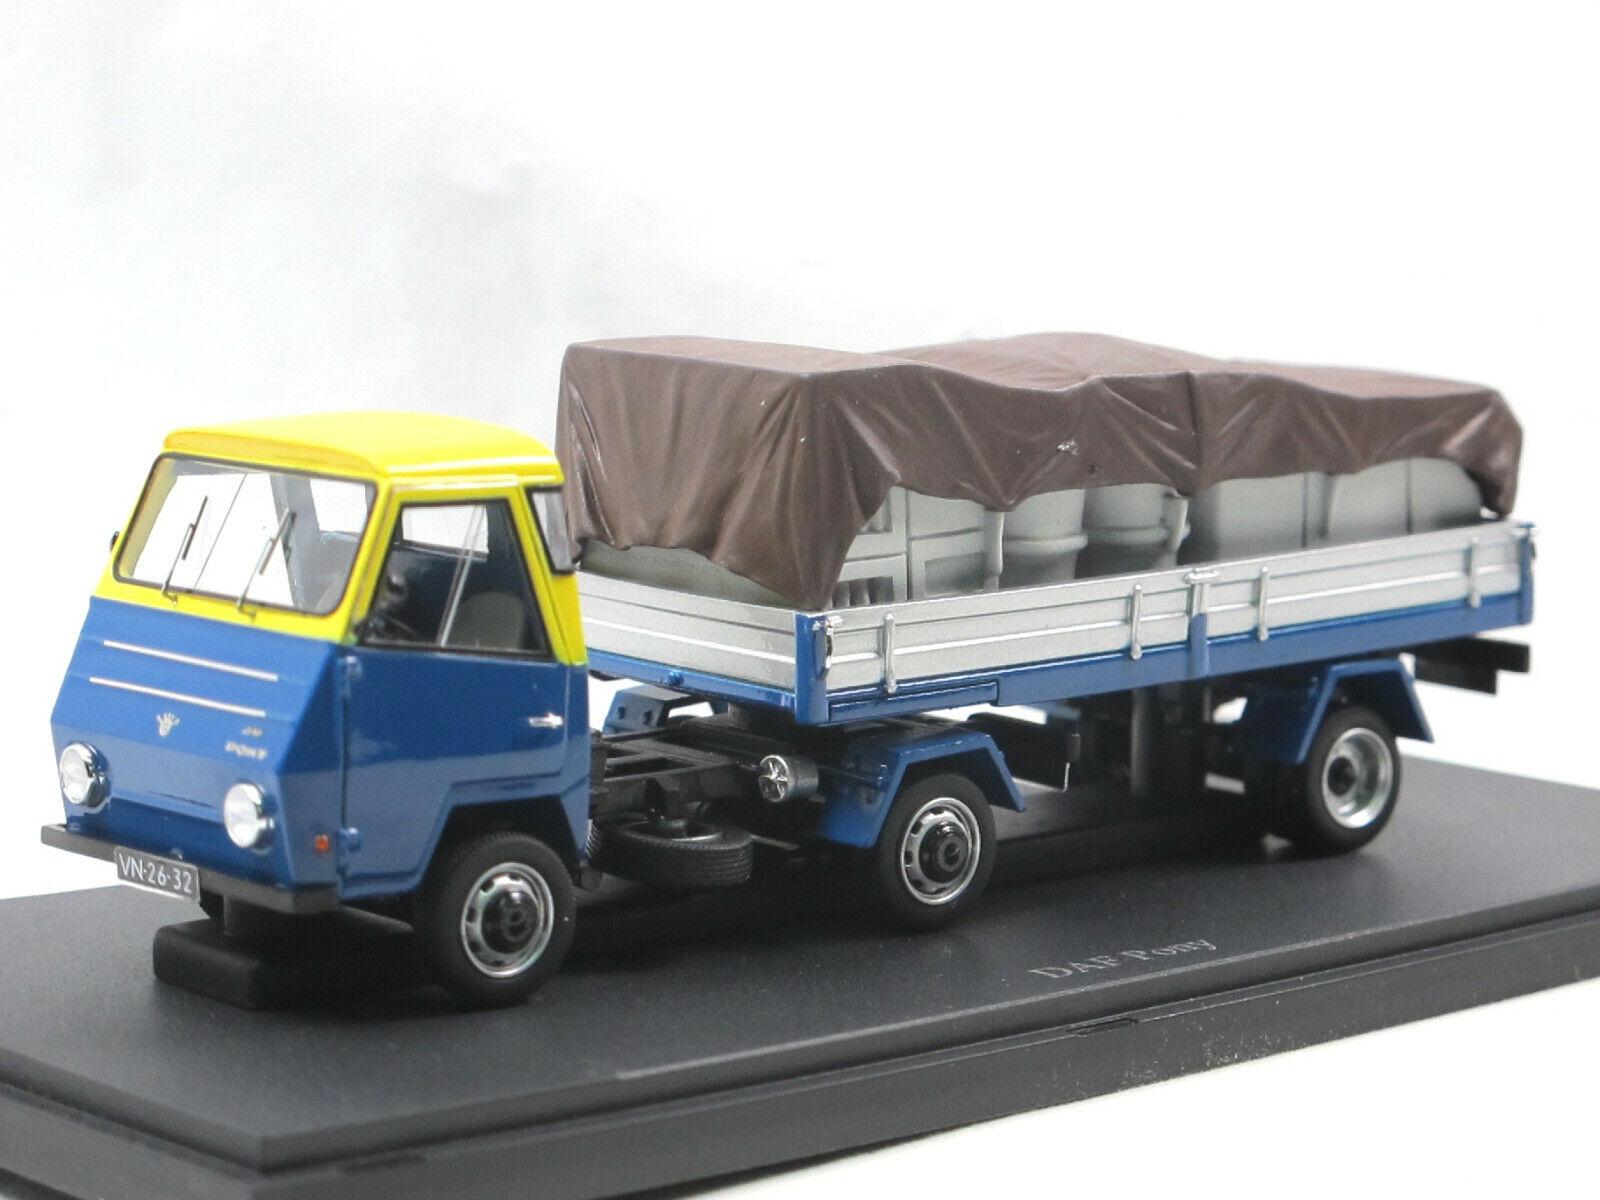 Autocult 08010 - 1968 DAF Pony tablillas-conducirse con carga blu 1 43 Limited